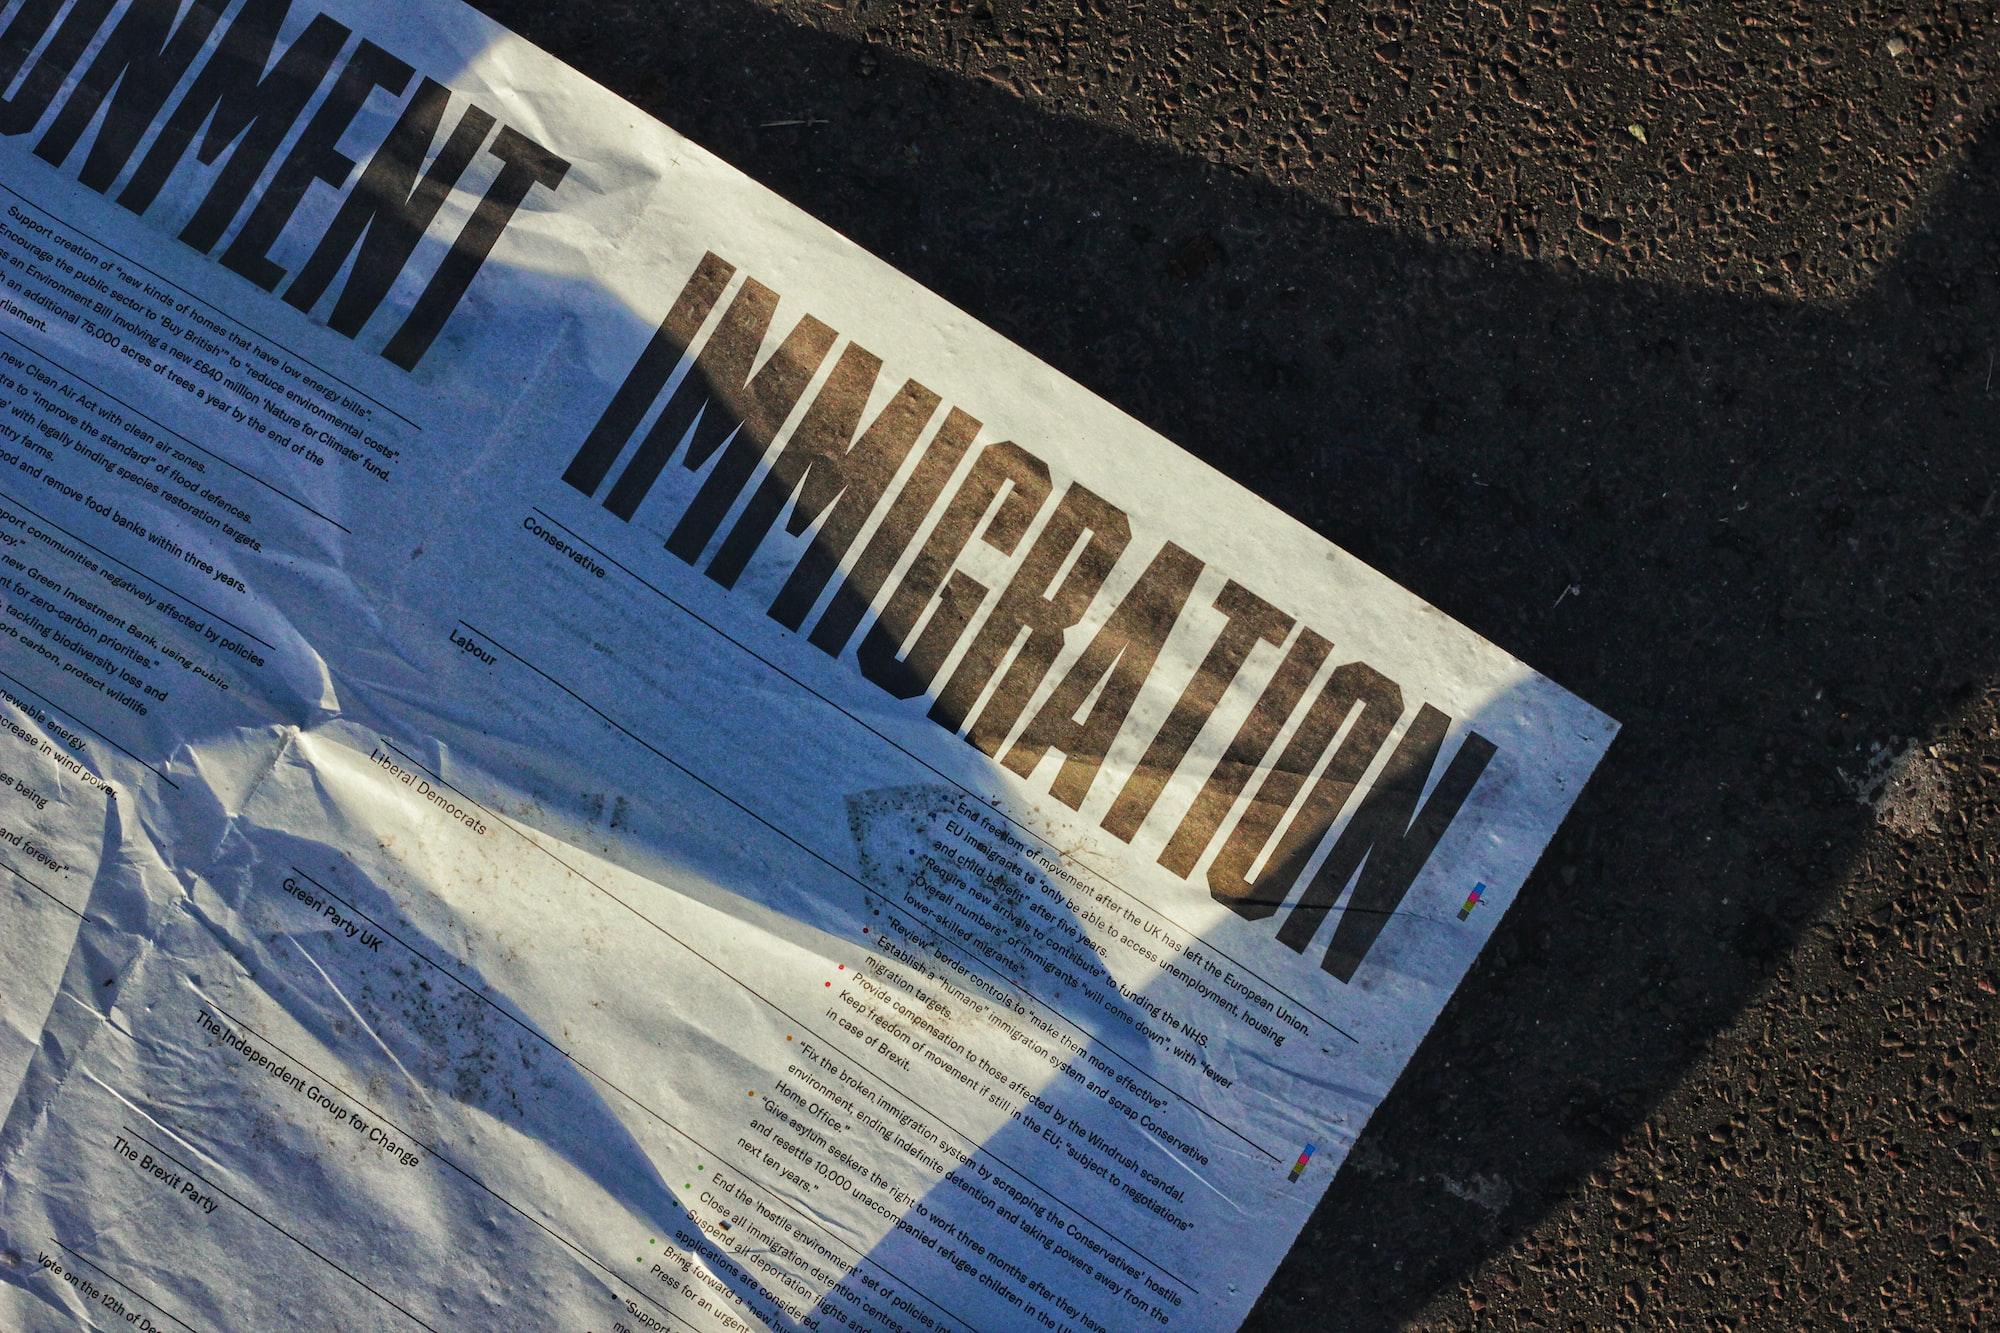 Indian nationals file lawsuit against US immigration service